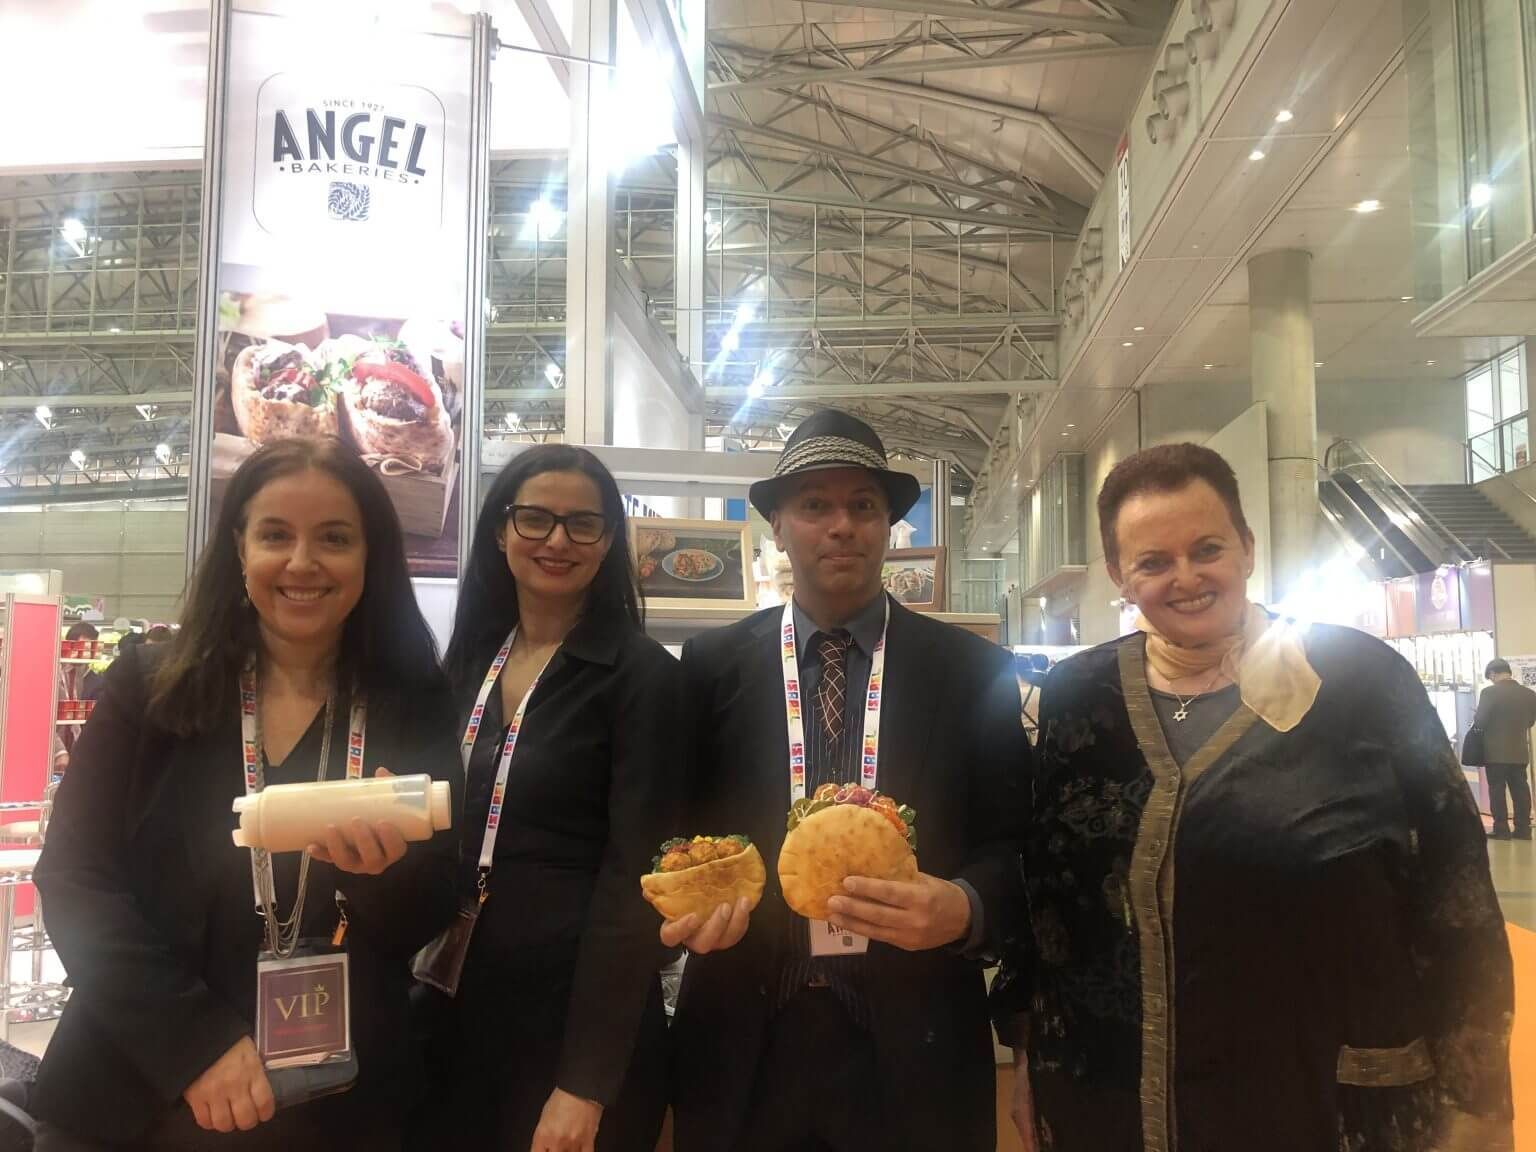 ANGEL Bakeriesの出展 – FOODEX Japan 2019にて